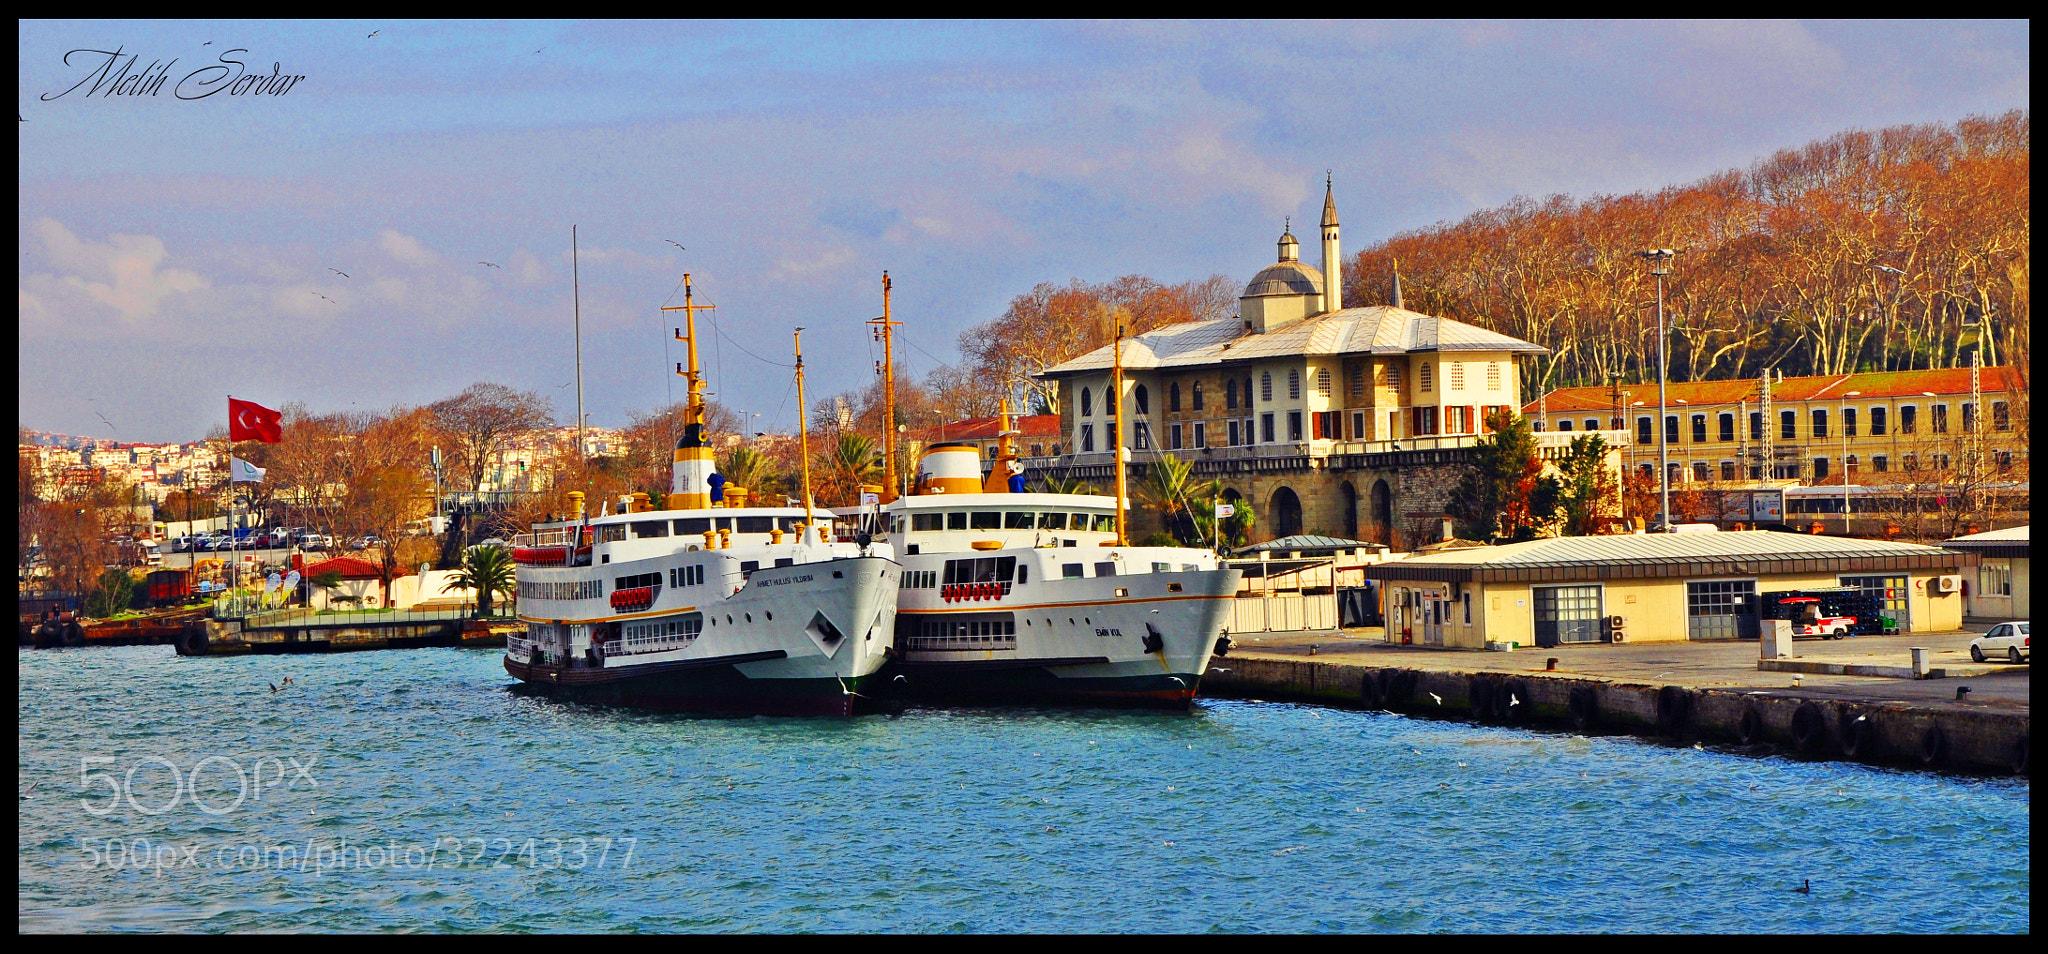 Photograph Topkapı Palace by Melih Gün on 500px